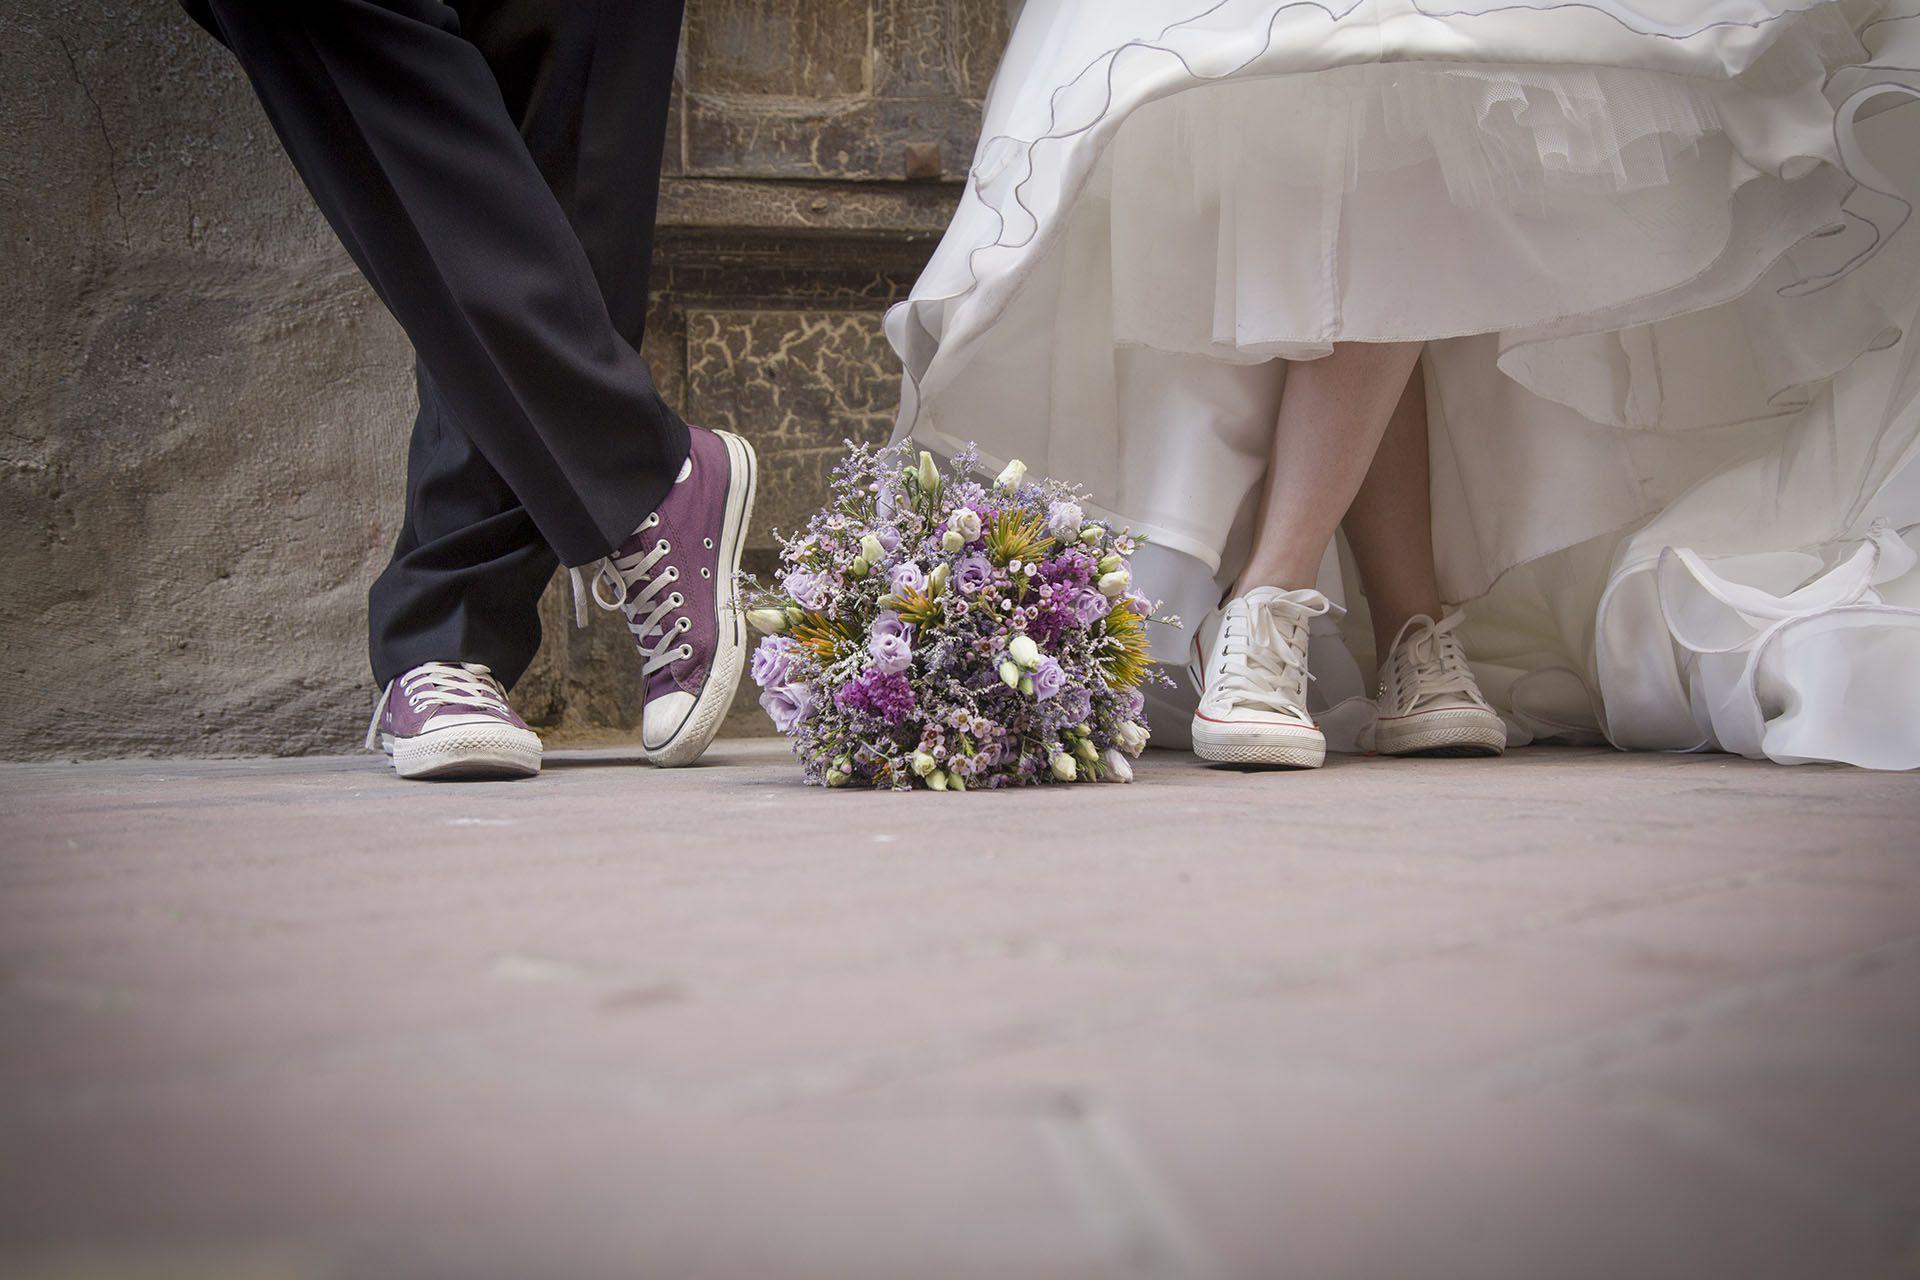 angela coronel-fotografia-bodas-molina de aragon-victor laura